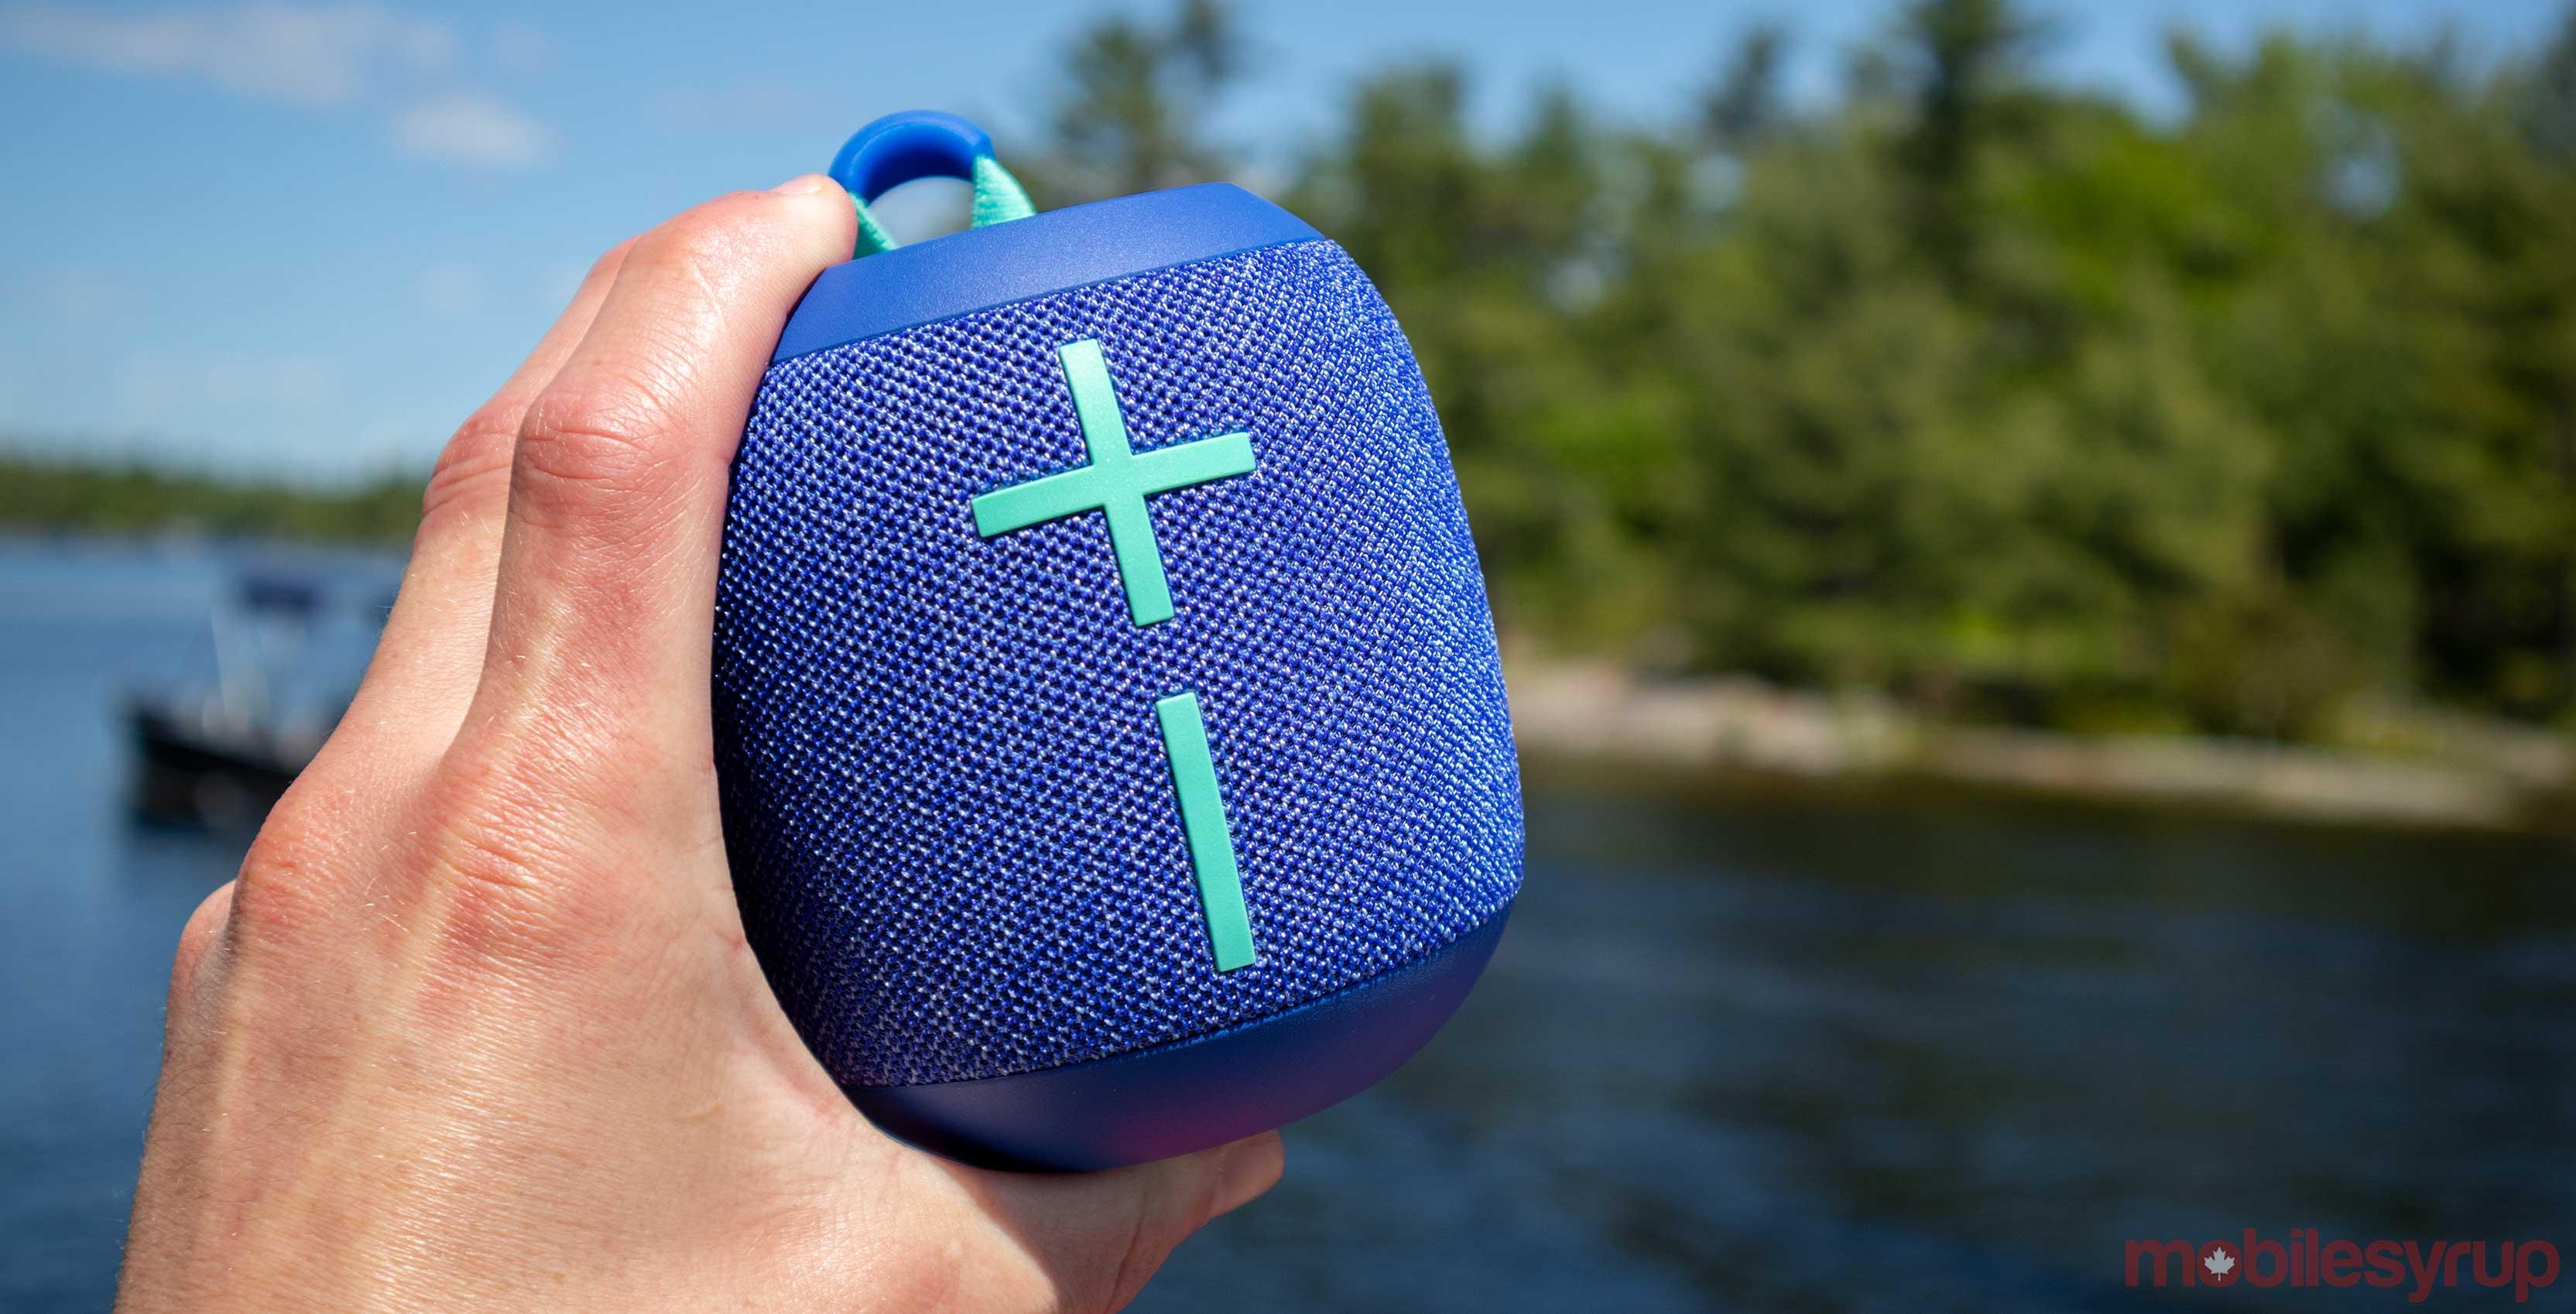 UE WonderBoom 2 Review: The perfect portable speaker